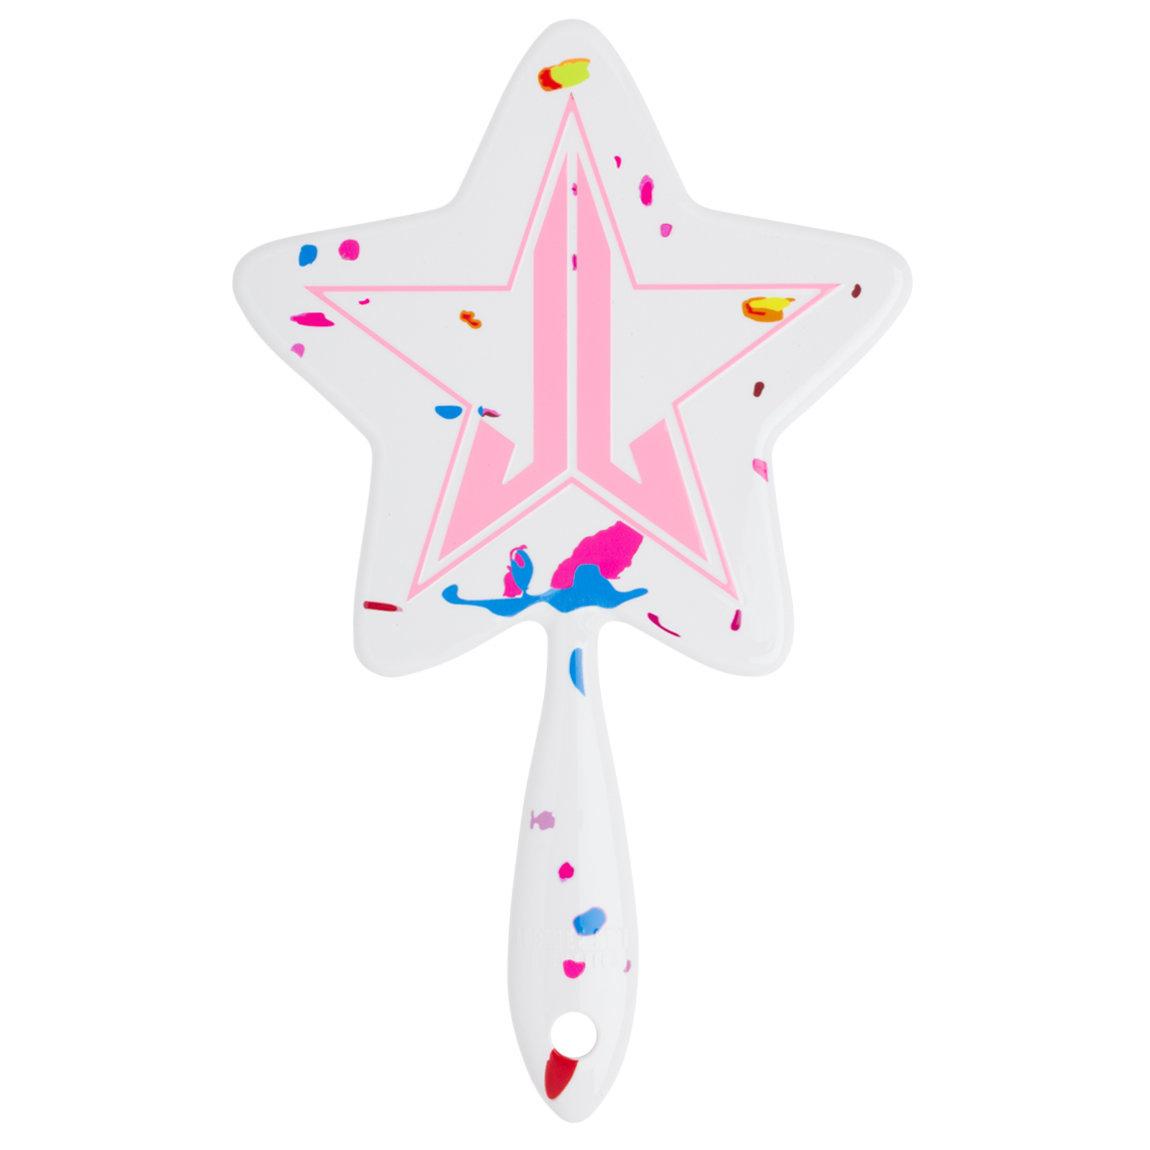 Jeffree Star Cosmetics Star Mirror White Jawbreaker product swatch.